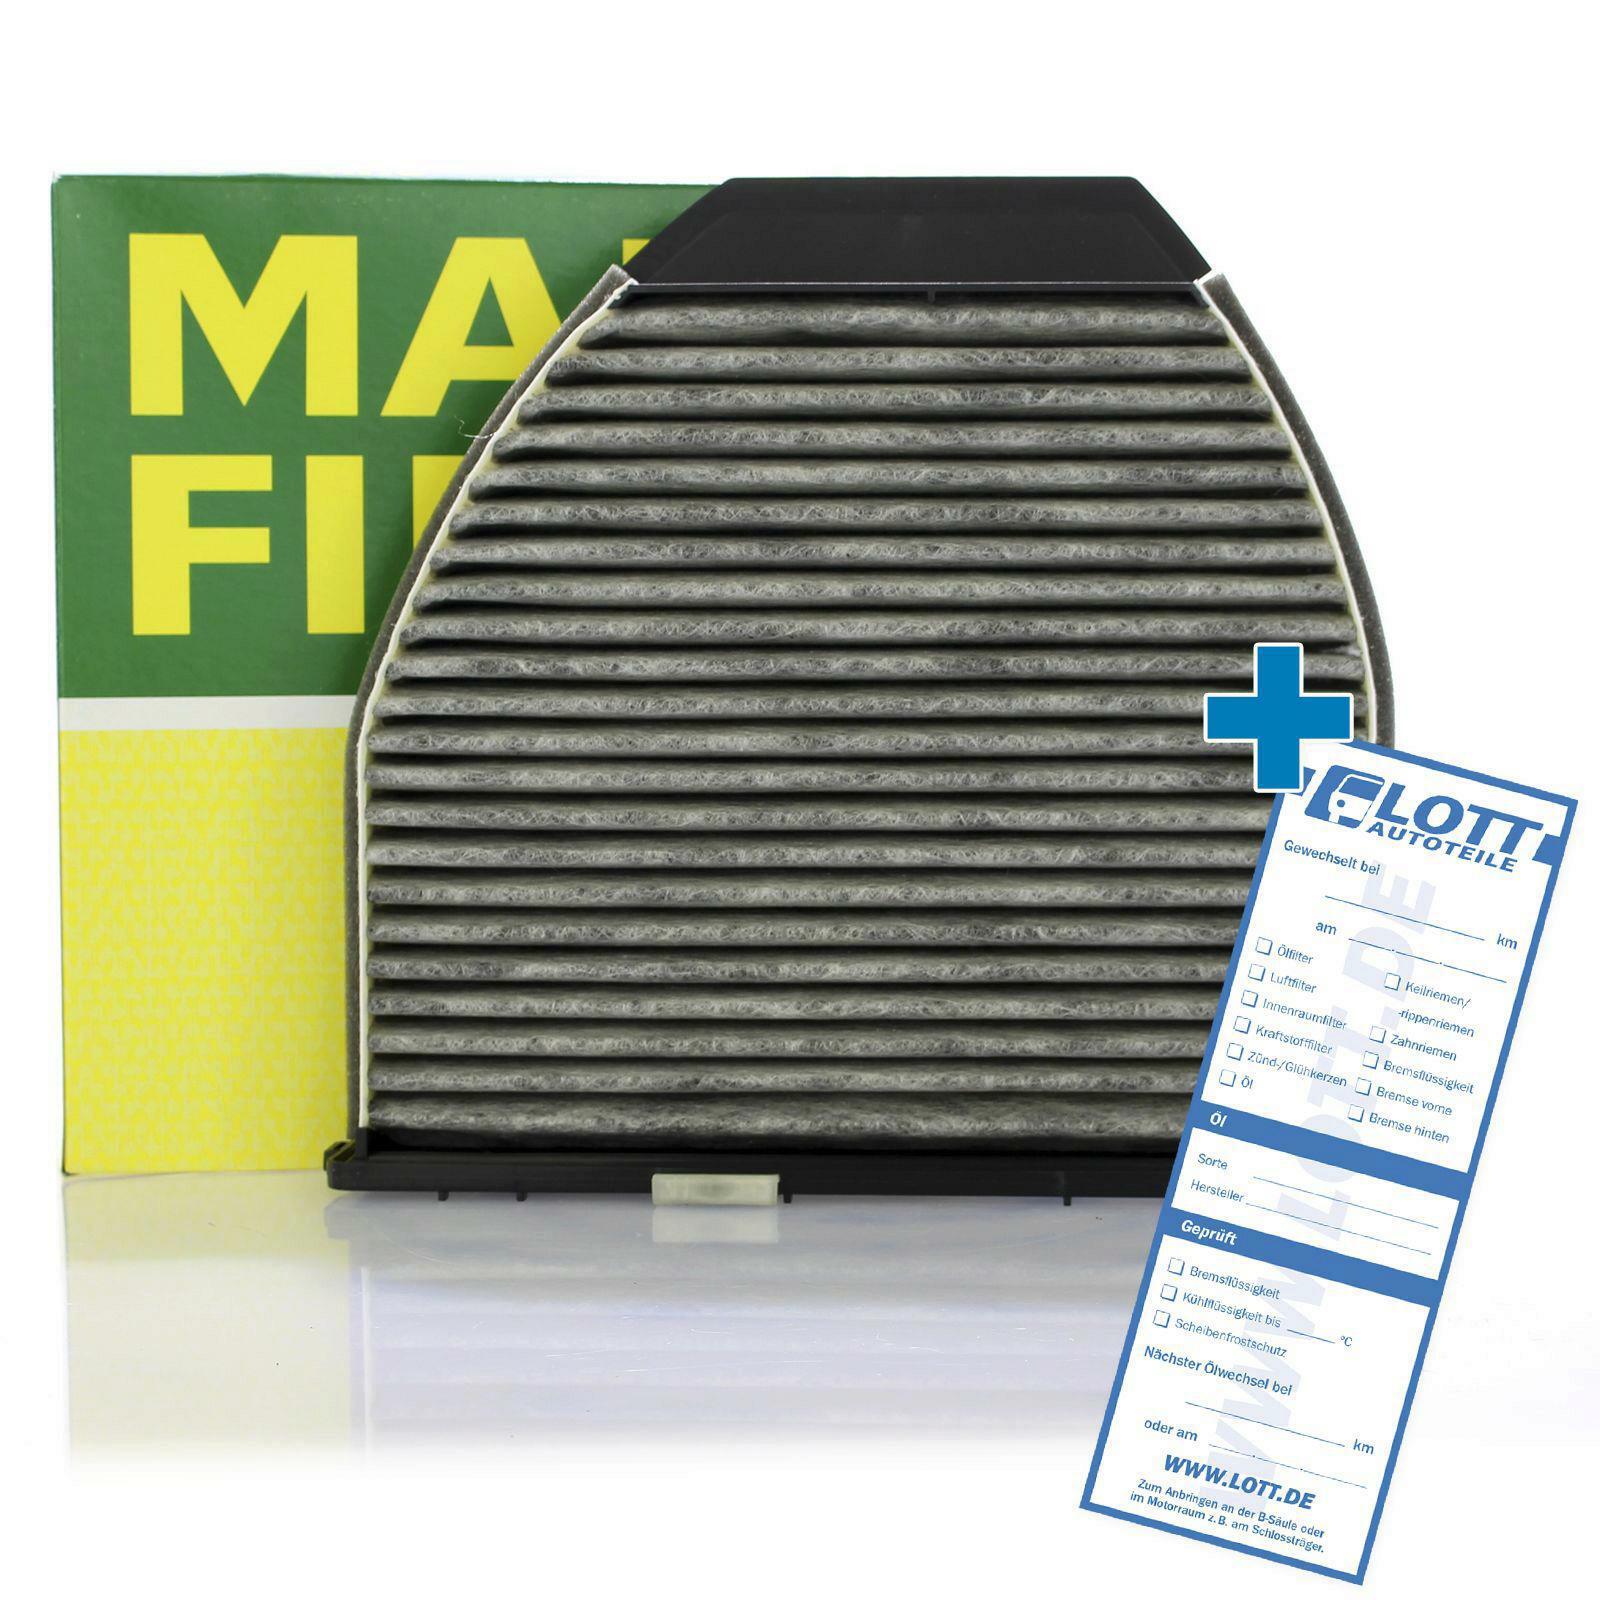 MANN-FILTER Filter, interior air adsotop